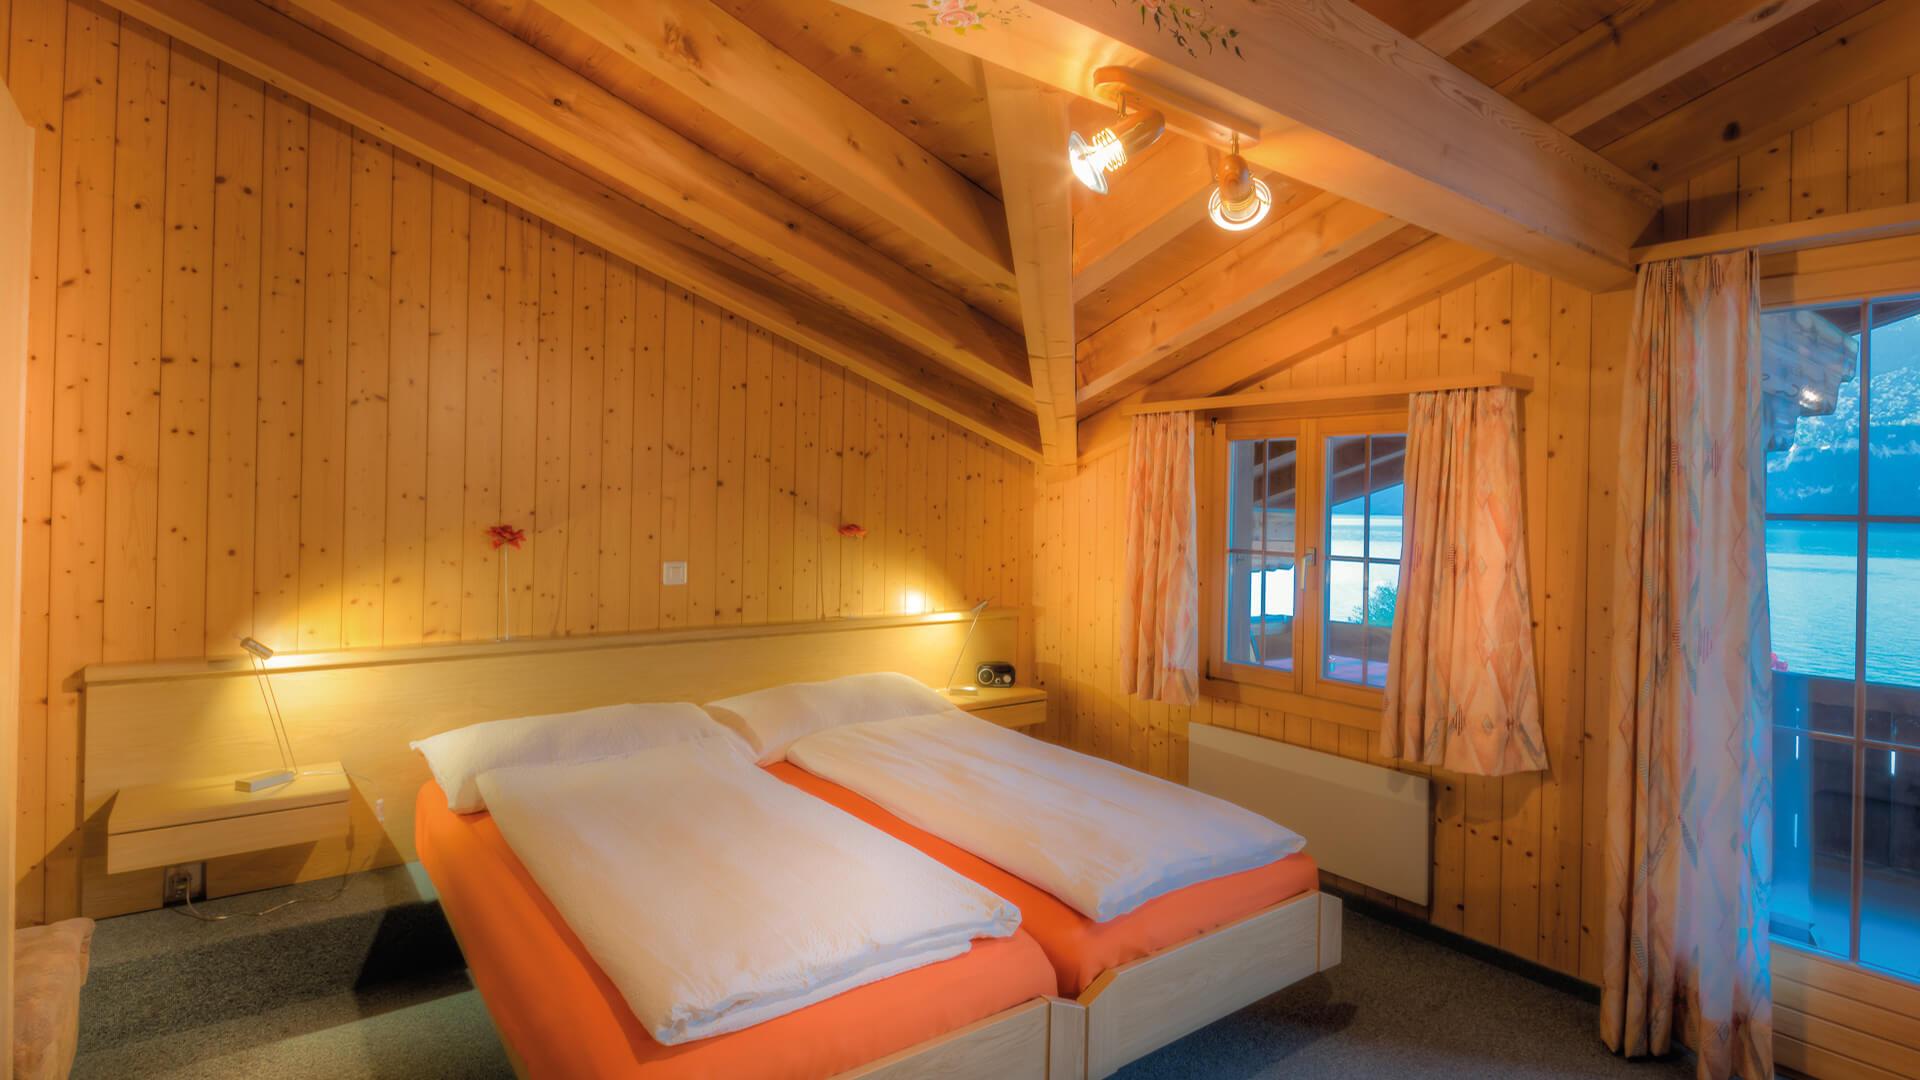 hotel-widibach-doppelzimmer